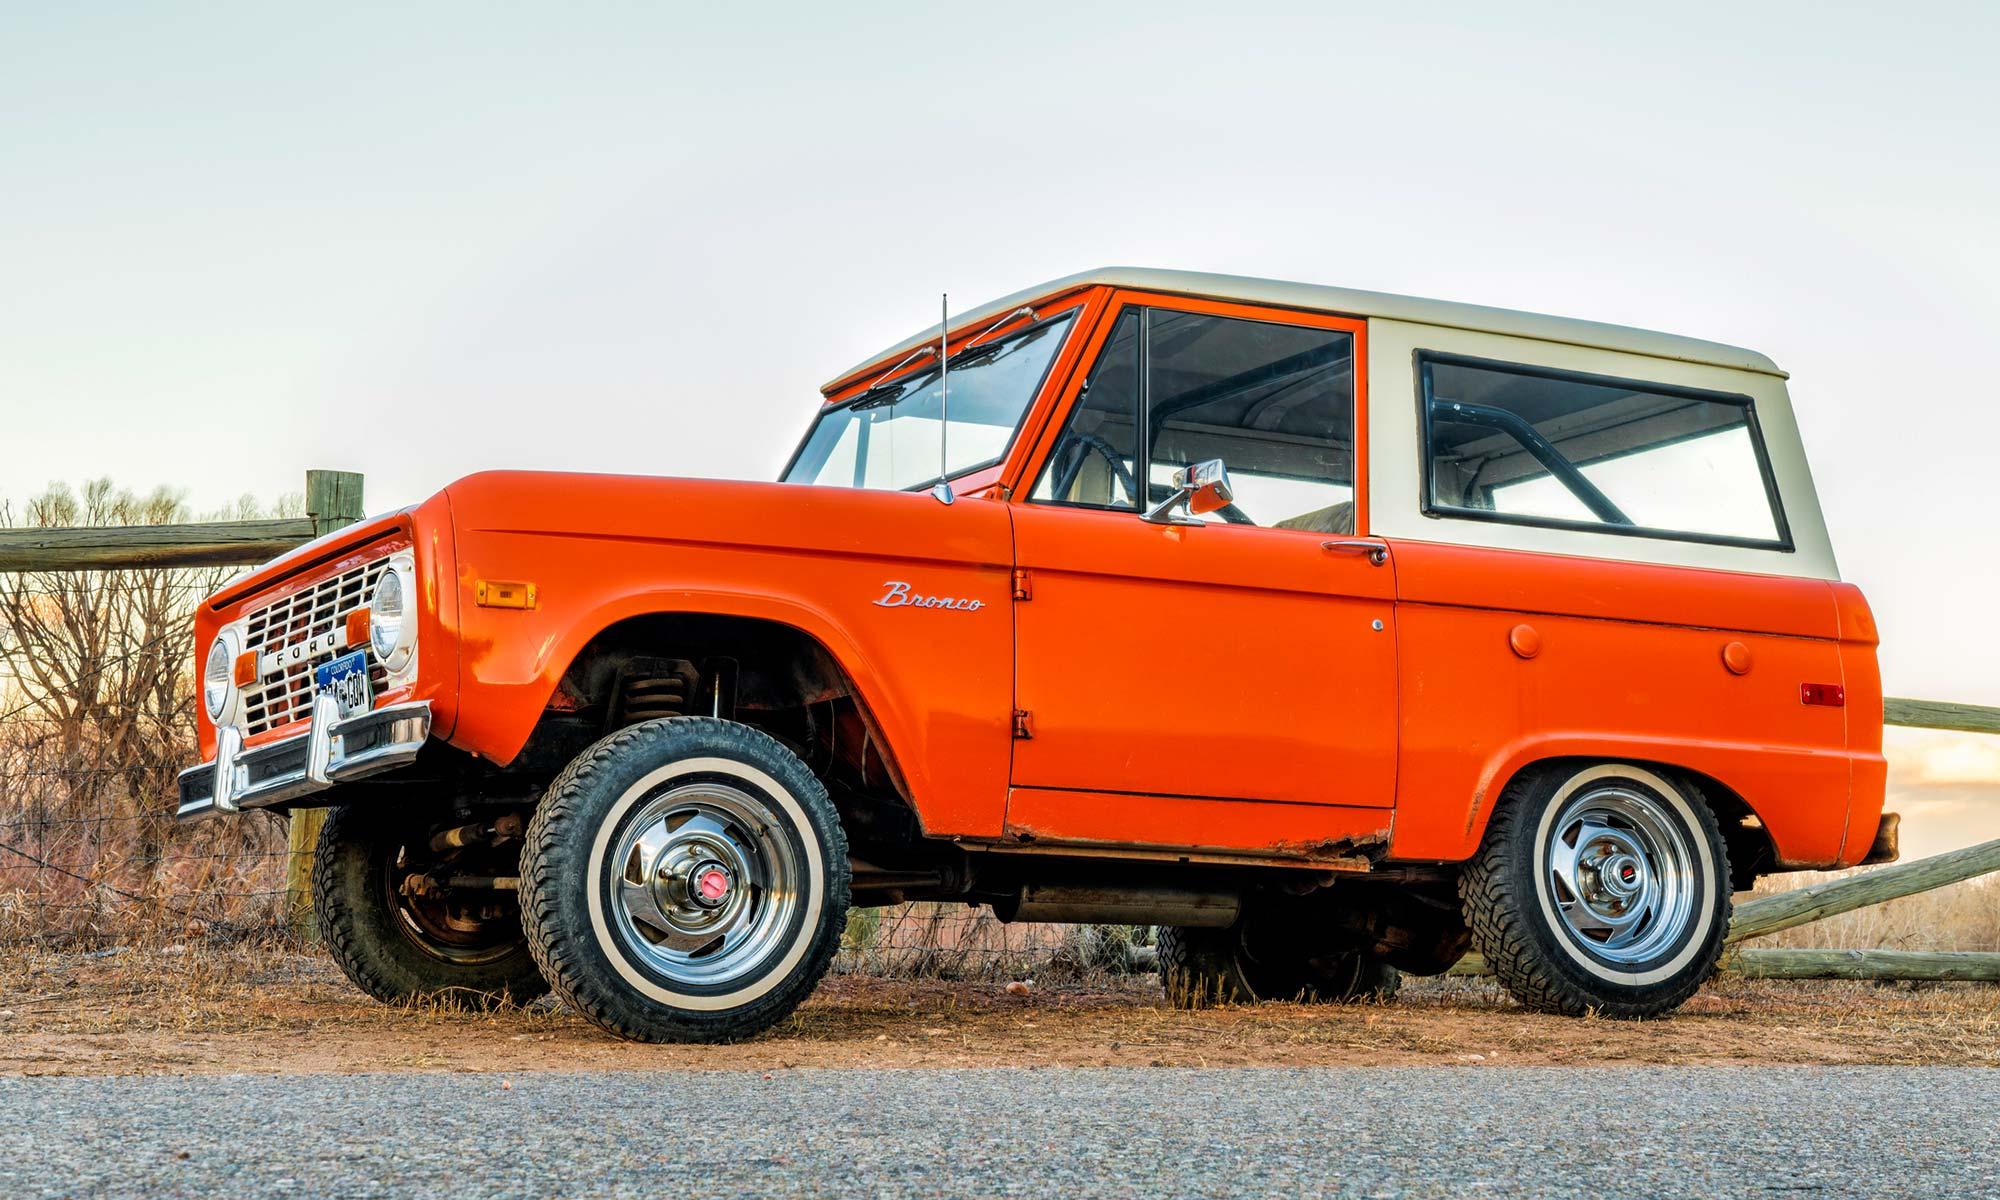 A vintage, first generation, orange Ford Bronco ranger wagon parked on a rural road.